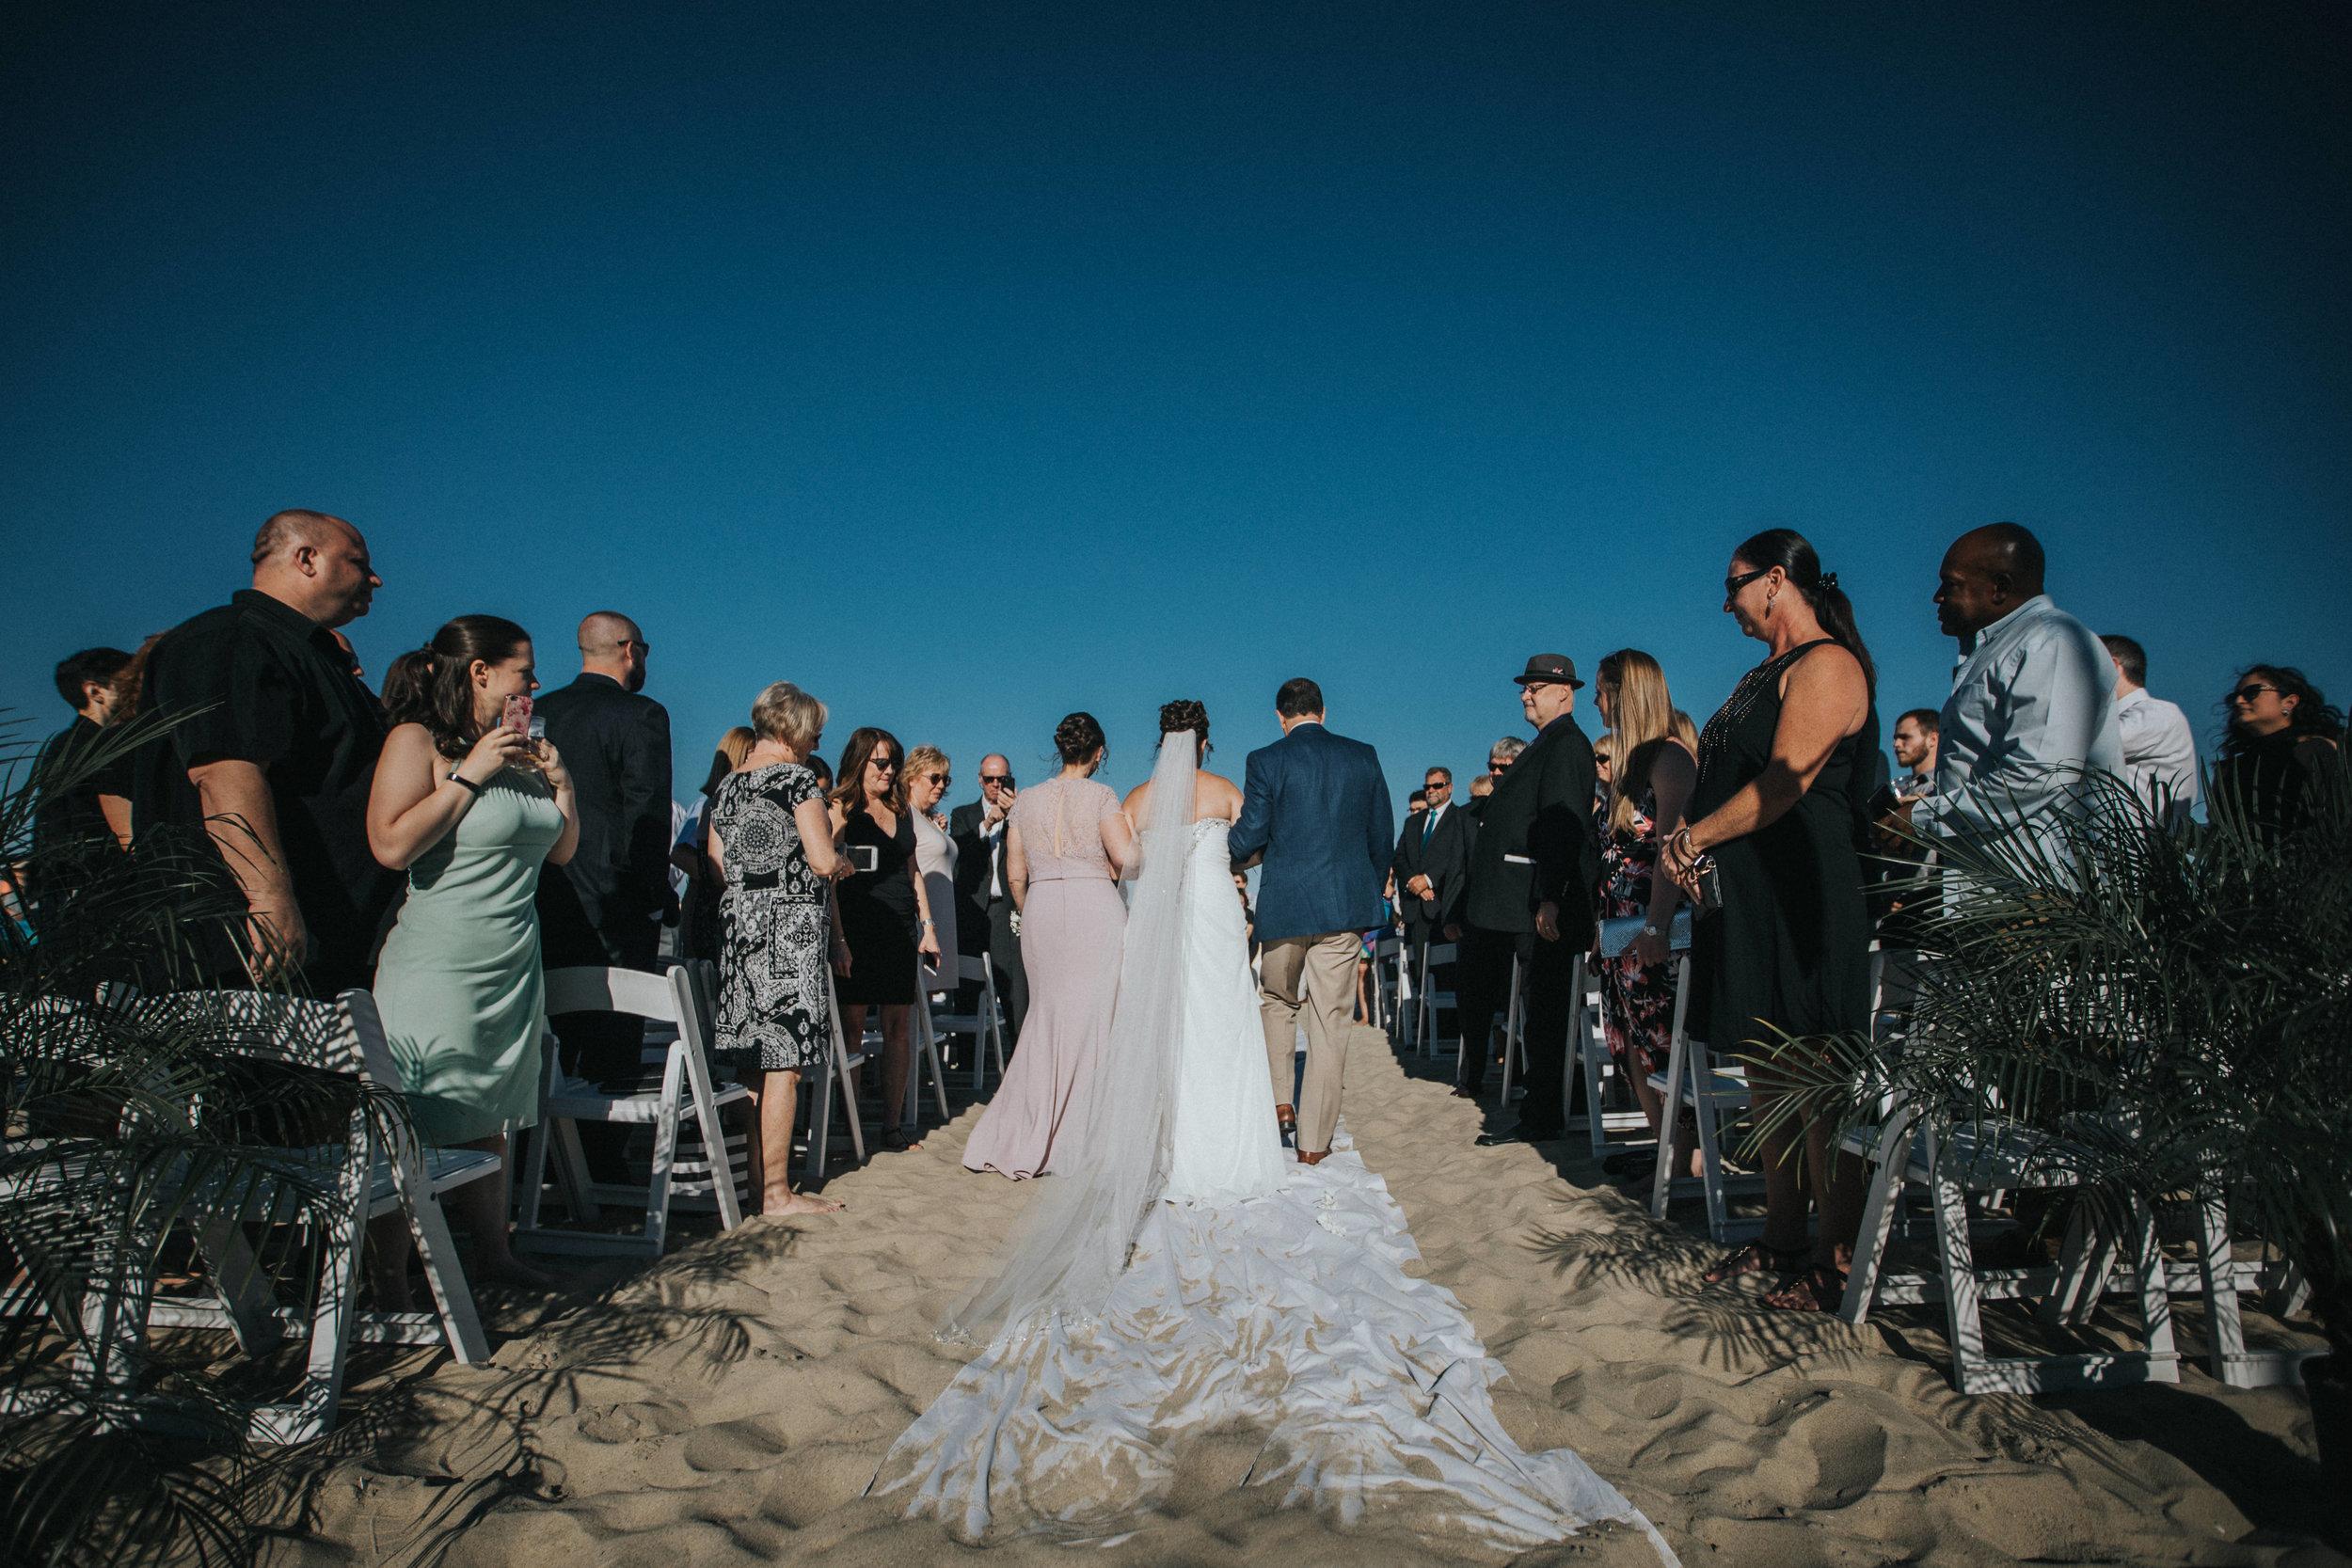 JennaLynnPhotography-NJWeddingPhotographer-Wedding-TheBerkeley-AsburyPark-Allison&Michael-Ceremony-57.jpg